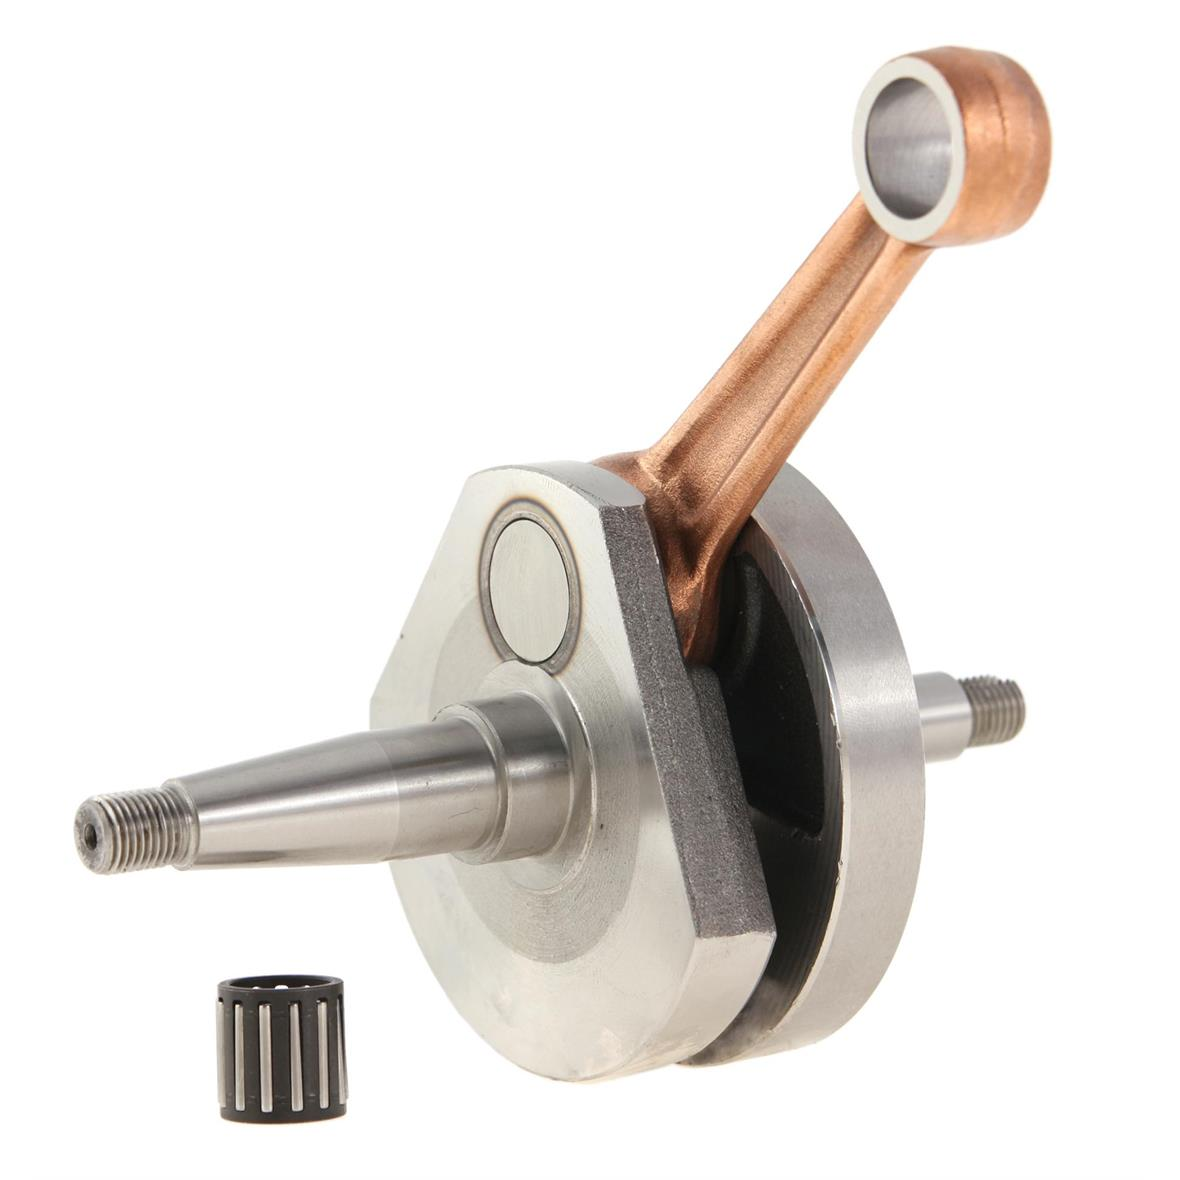 Product Image for 'Crankshaft MAZZUCCHELLI for SIPTitle'